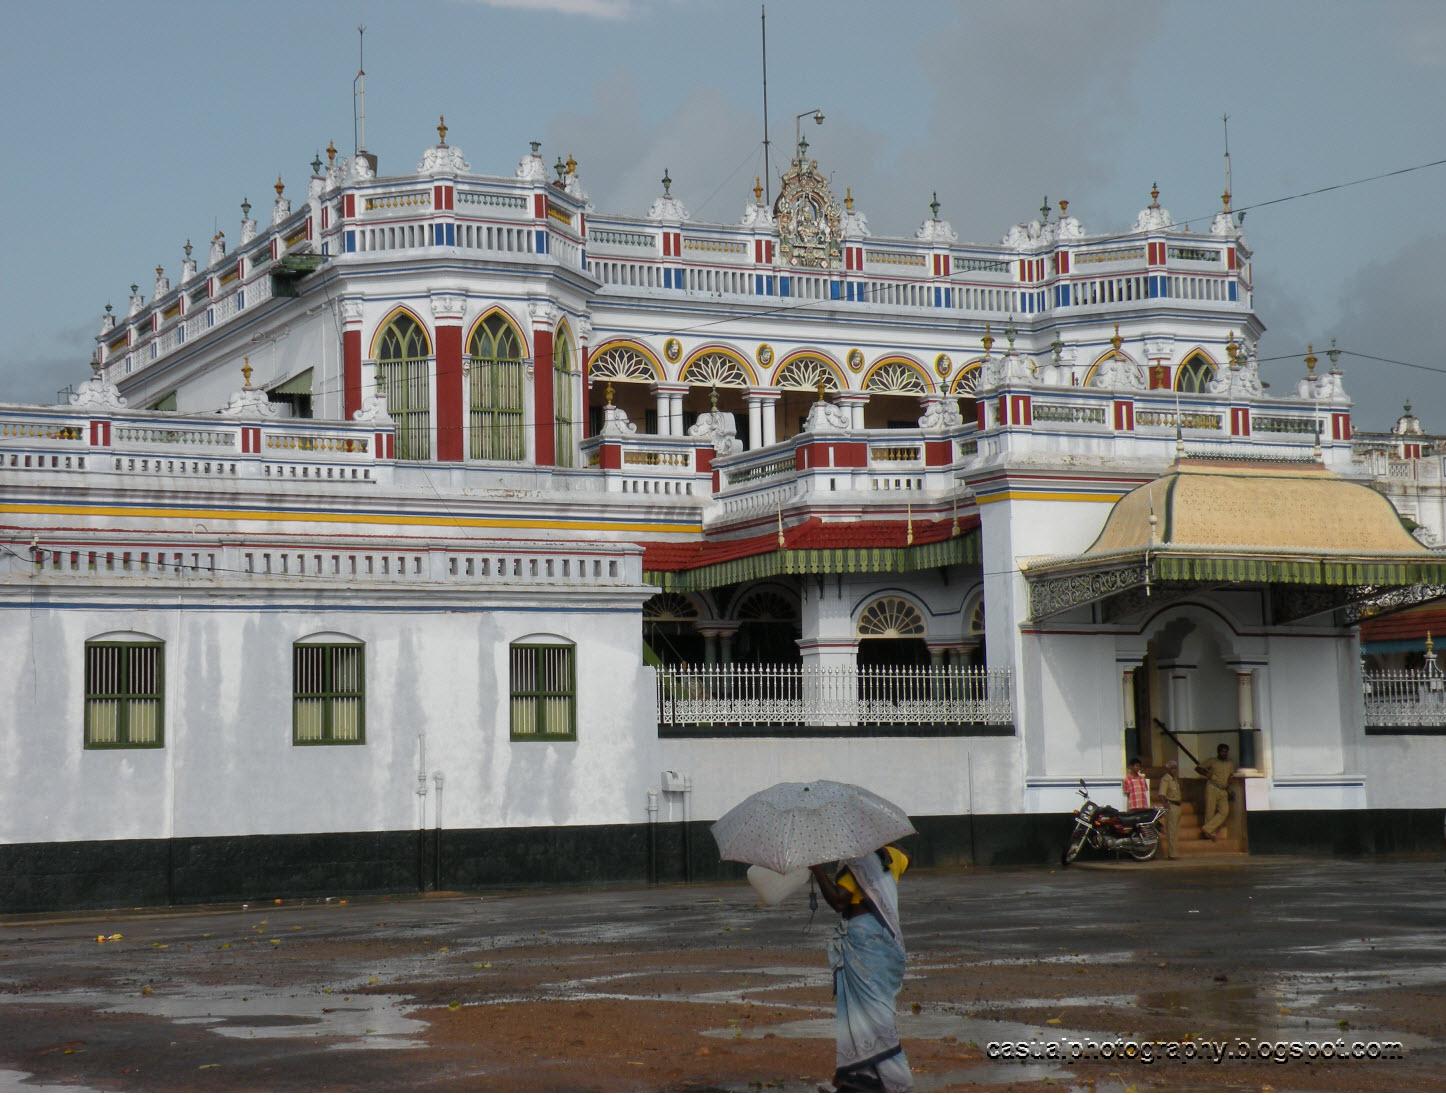 Kanadukathan India  city photos : ... Tamilnadu Photography: Karaikudi Kanadukathan Chettinad Palace Views